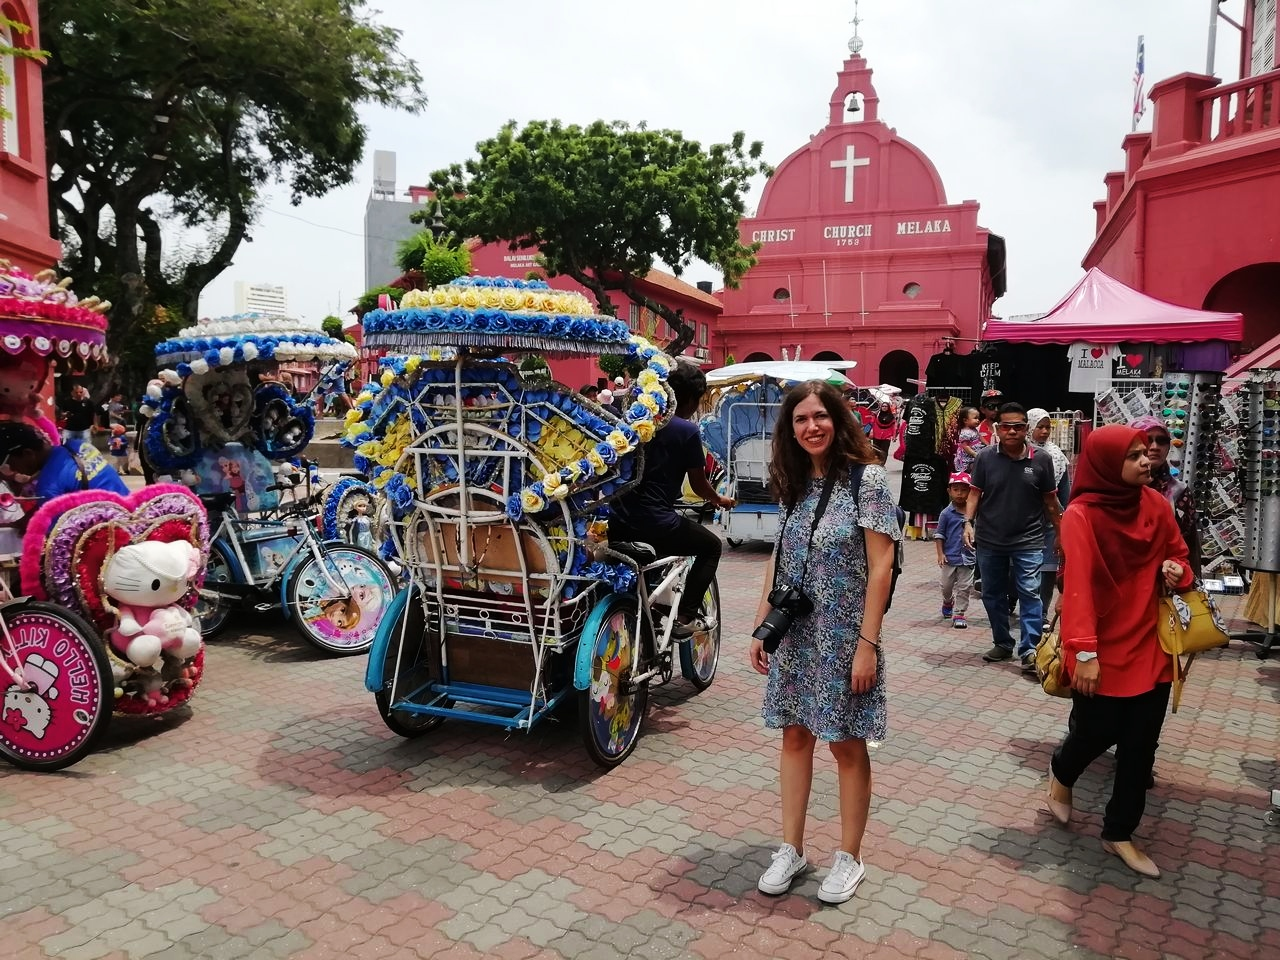 Malasia en 10 días: visita la famosa Dutch Square roja. ¿Qué te parecen los rickshaws?